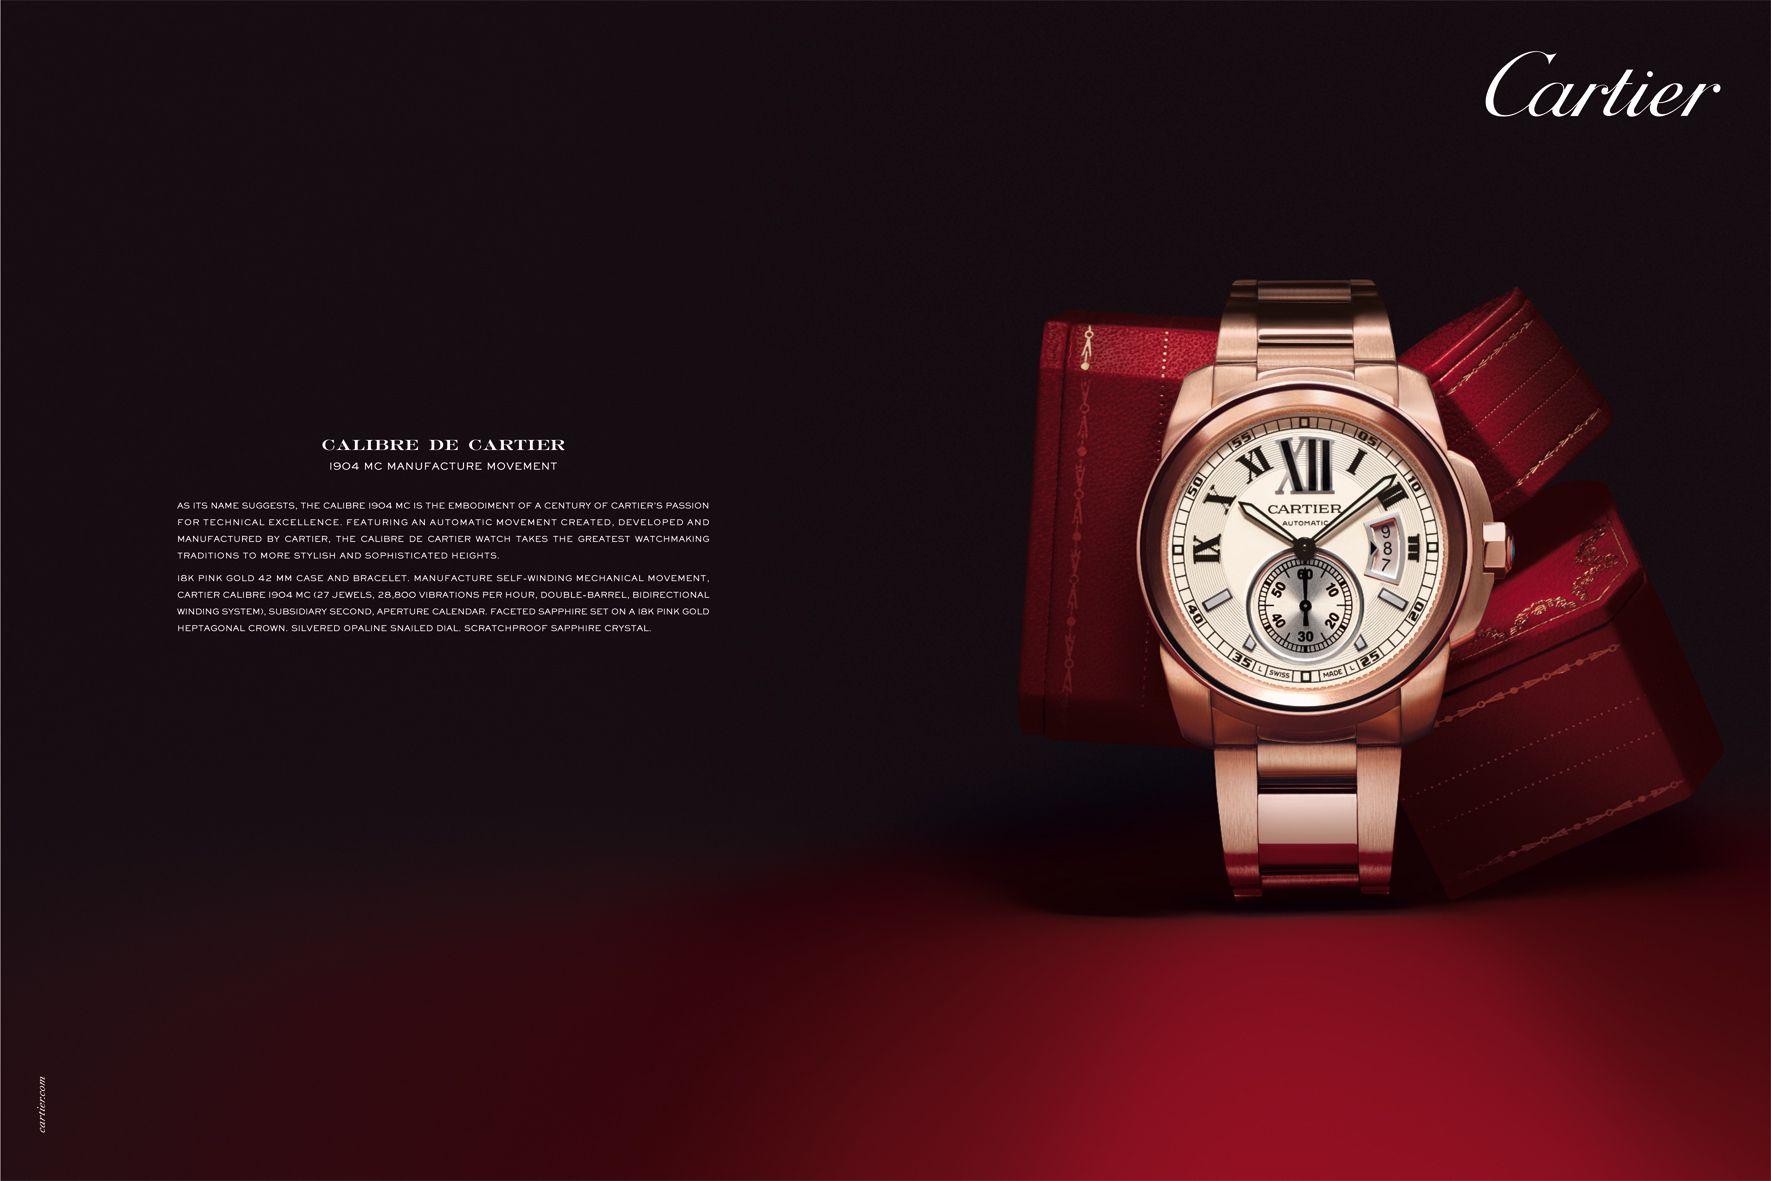 Calibre De Cartier Advertising Womens Watches Cartier Men Luxury Advertising